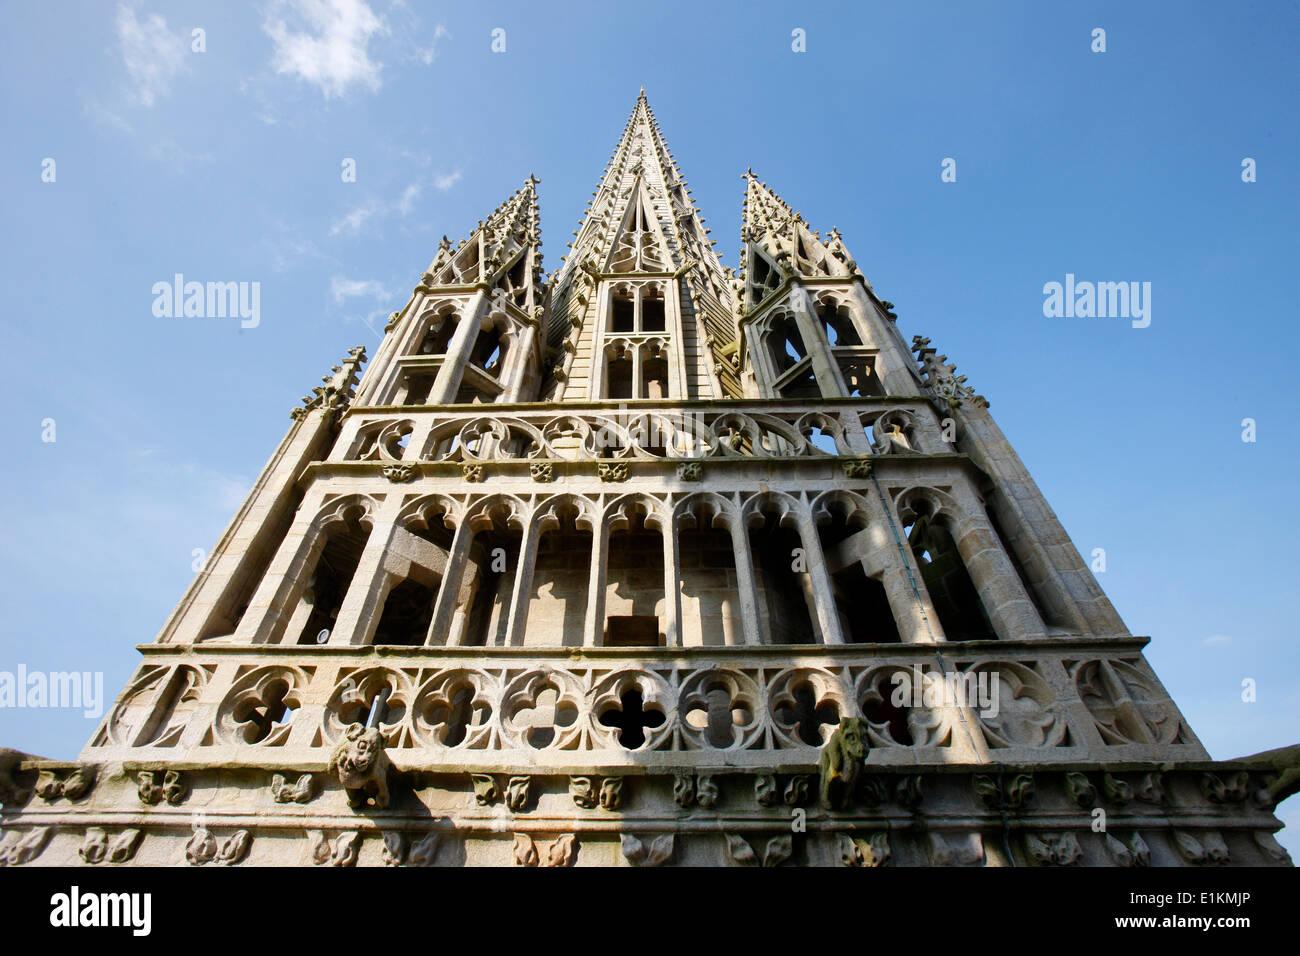 Saint-Corentin cathedral squire, Quimper - Stock Image